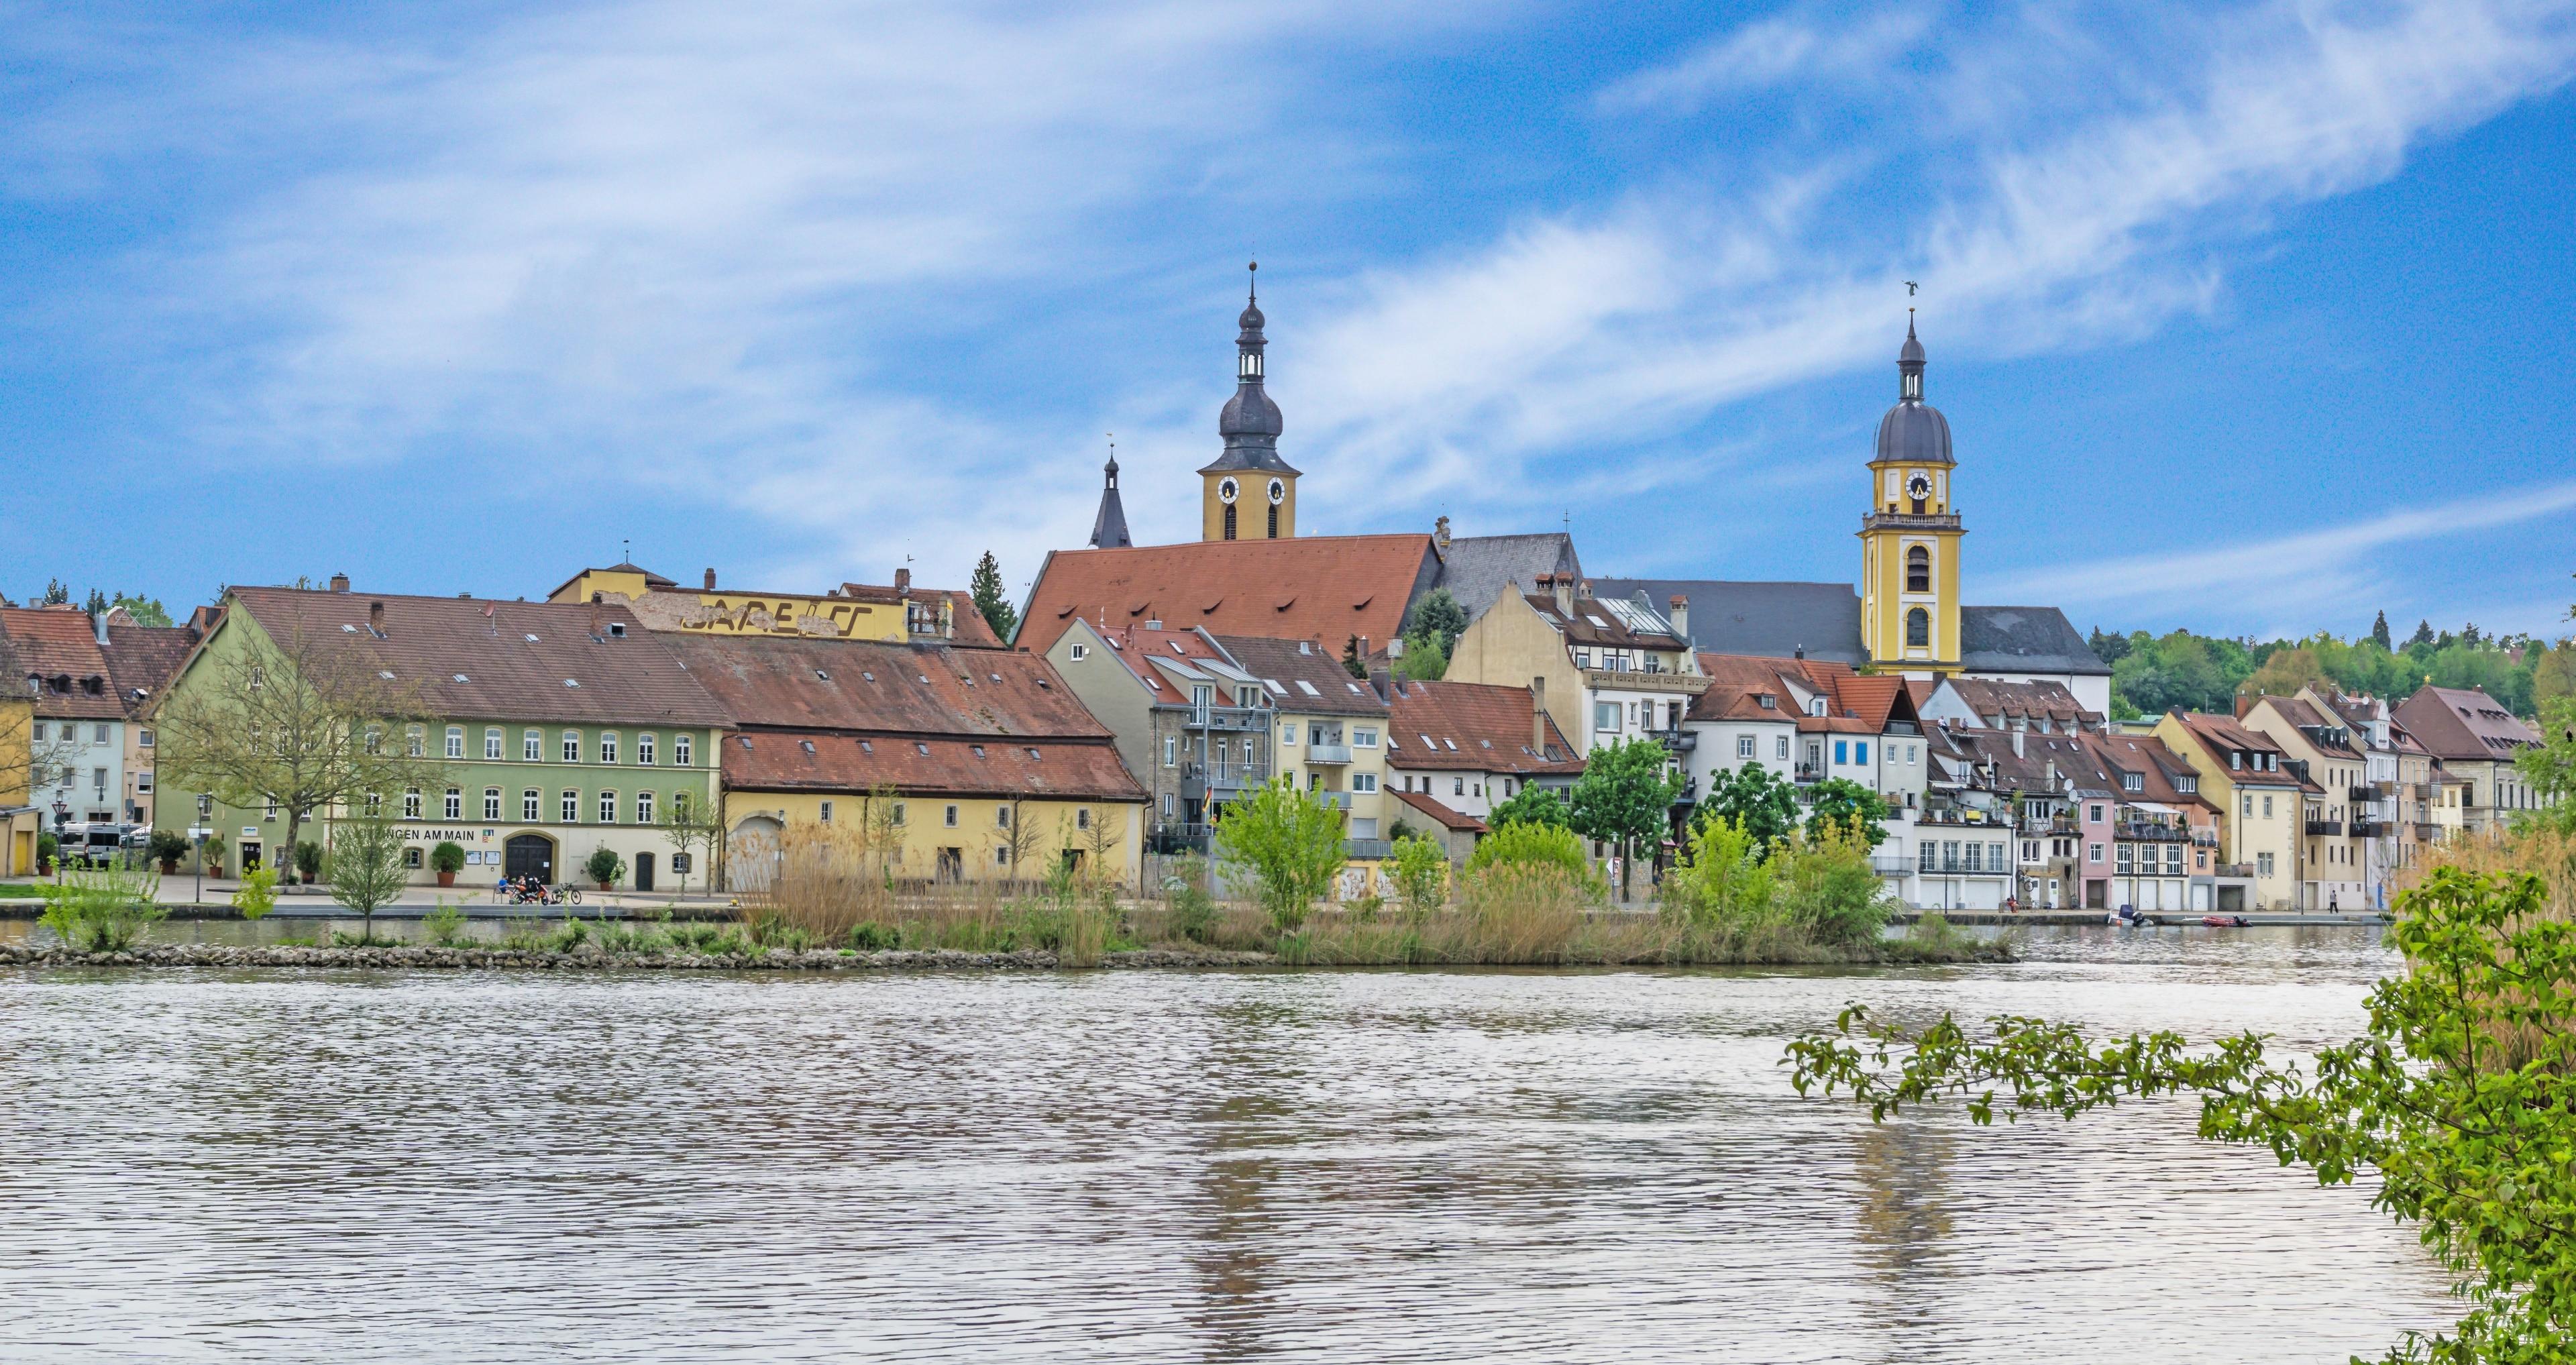 Kitzingen, Bavaria, Germany